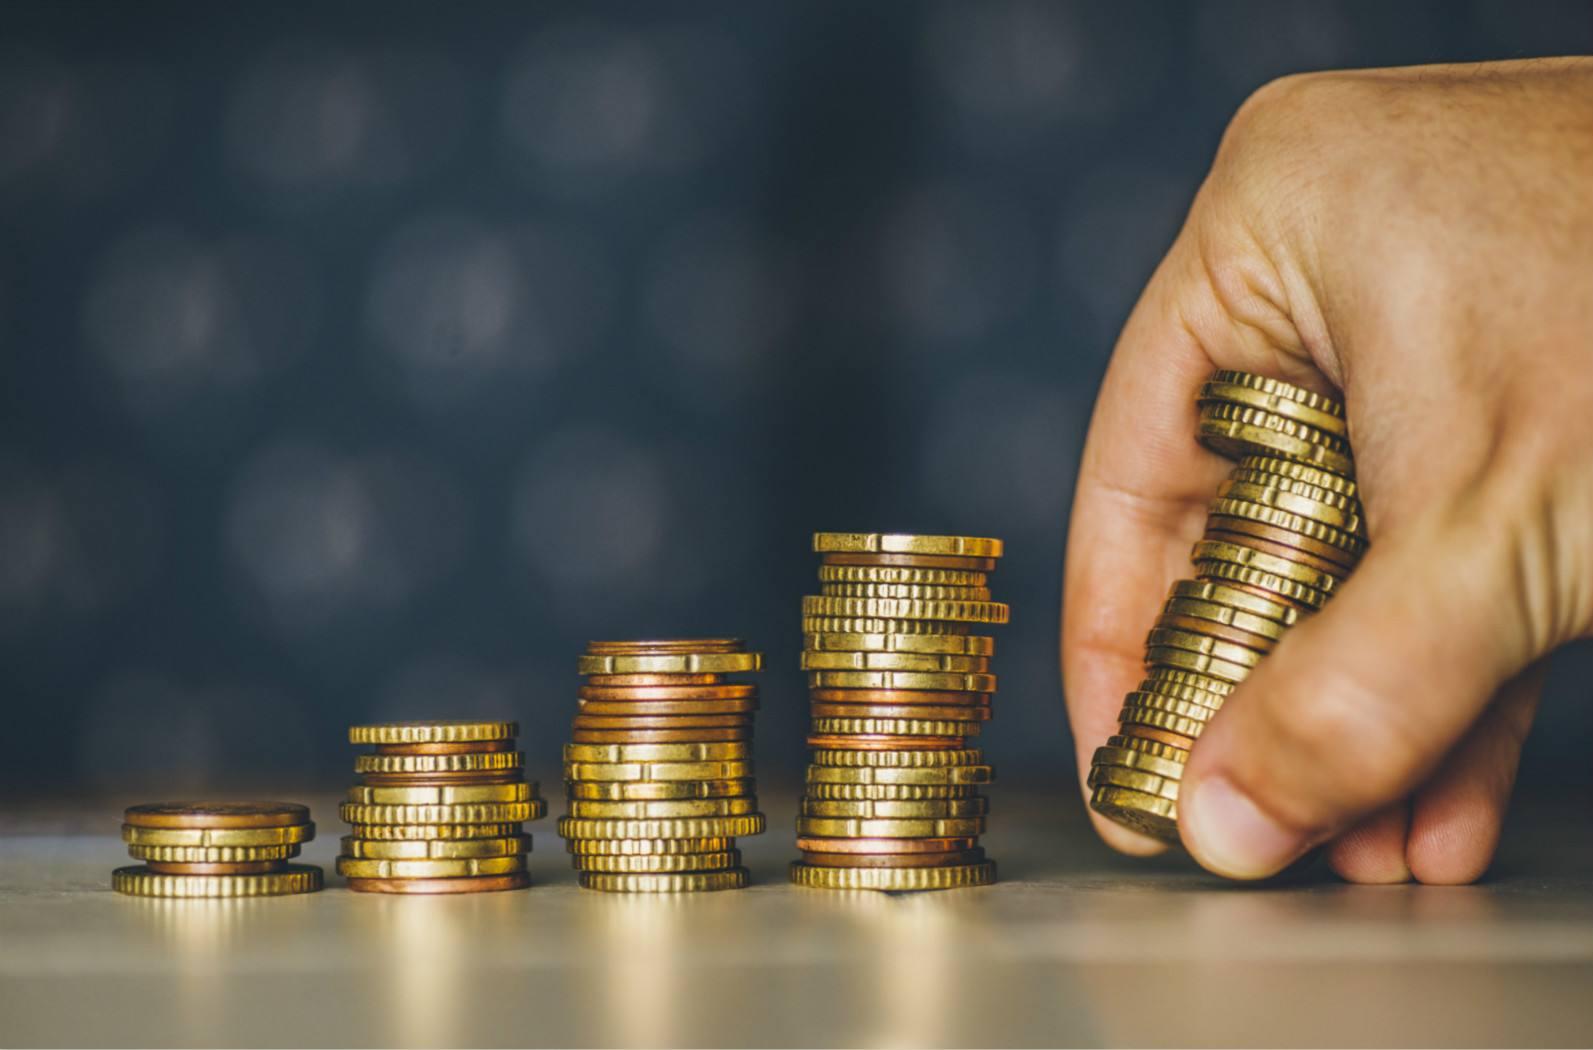 financing cost,降低企业融资成本的途径,essay代写,paper代写,作业代写